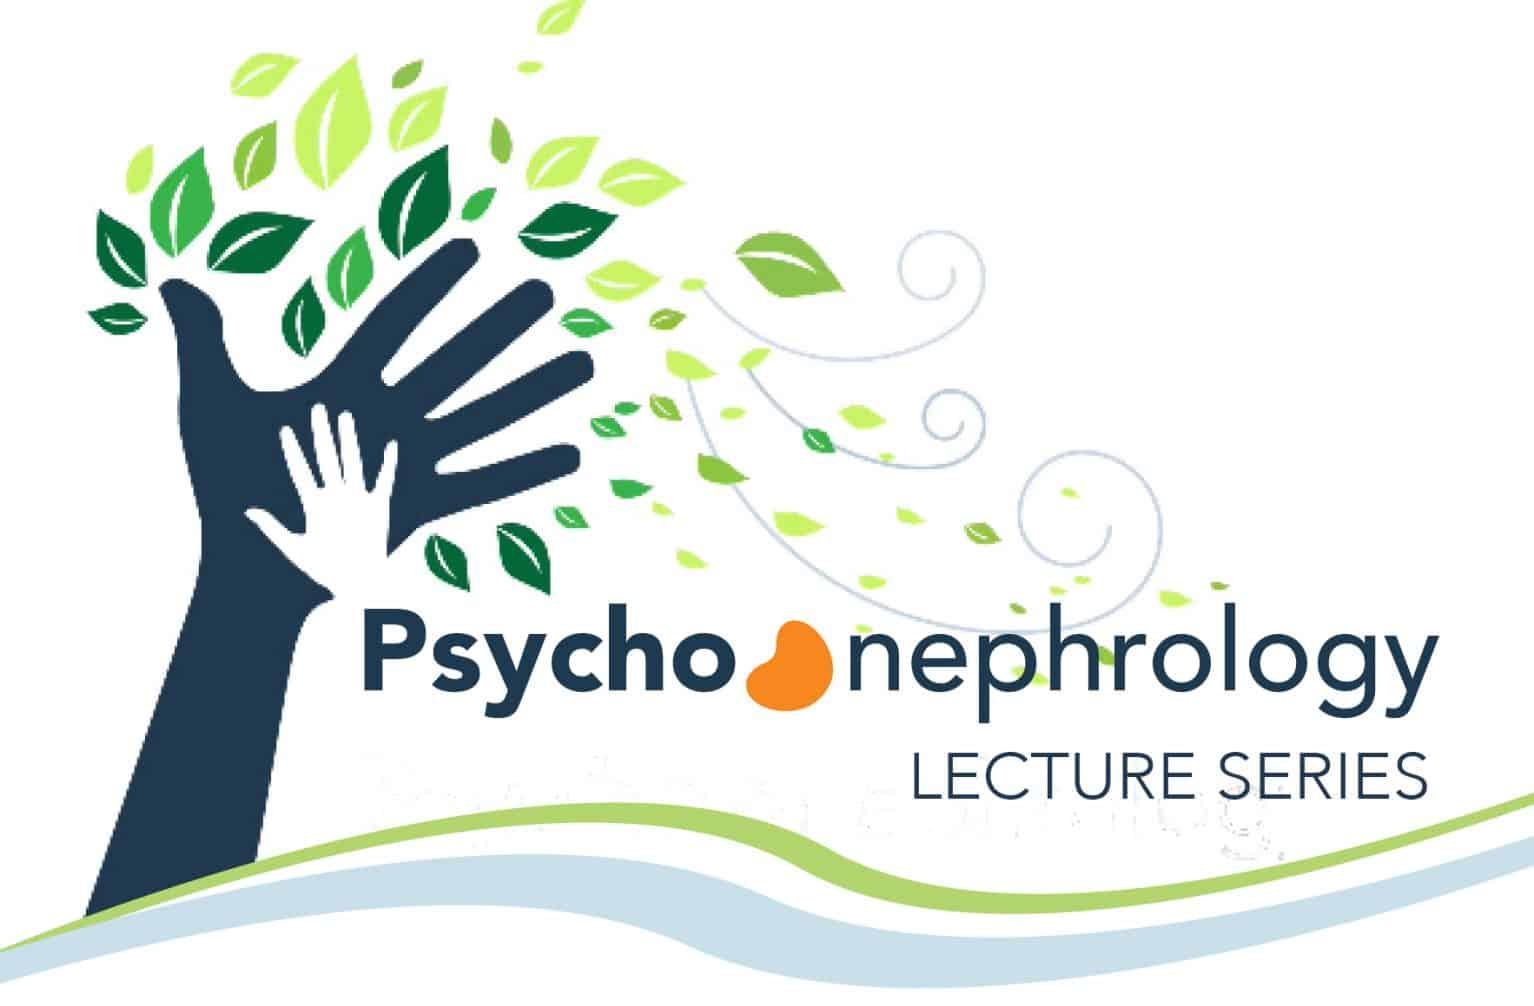 psychonephrology-kidney-nephrology-physician-assisted-death